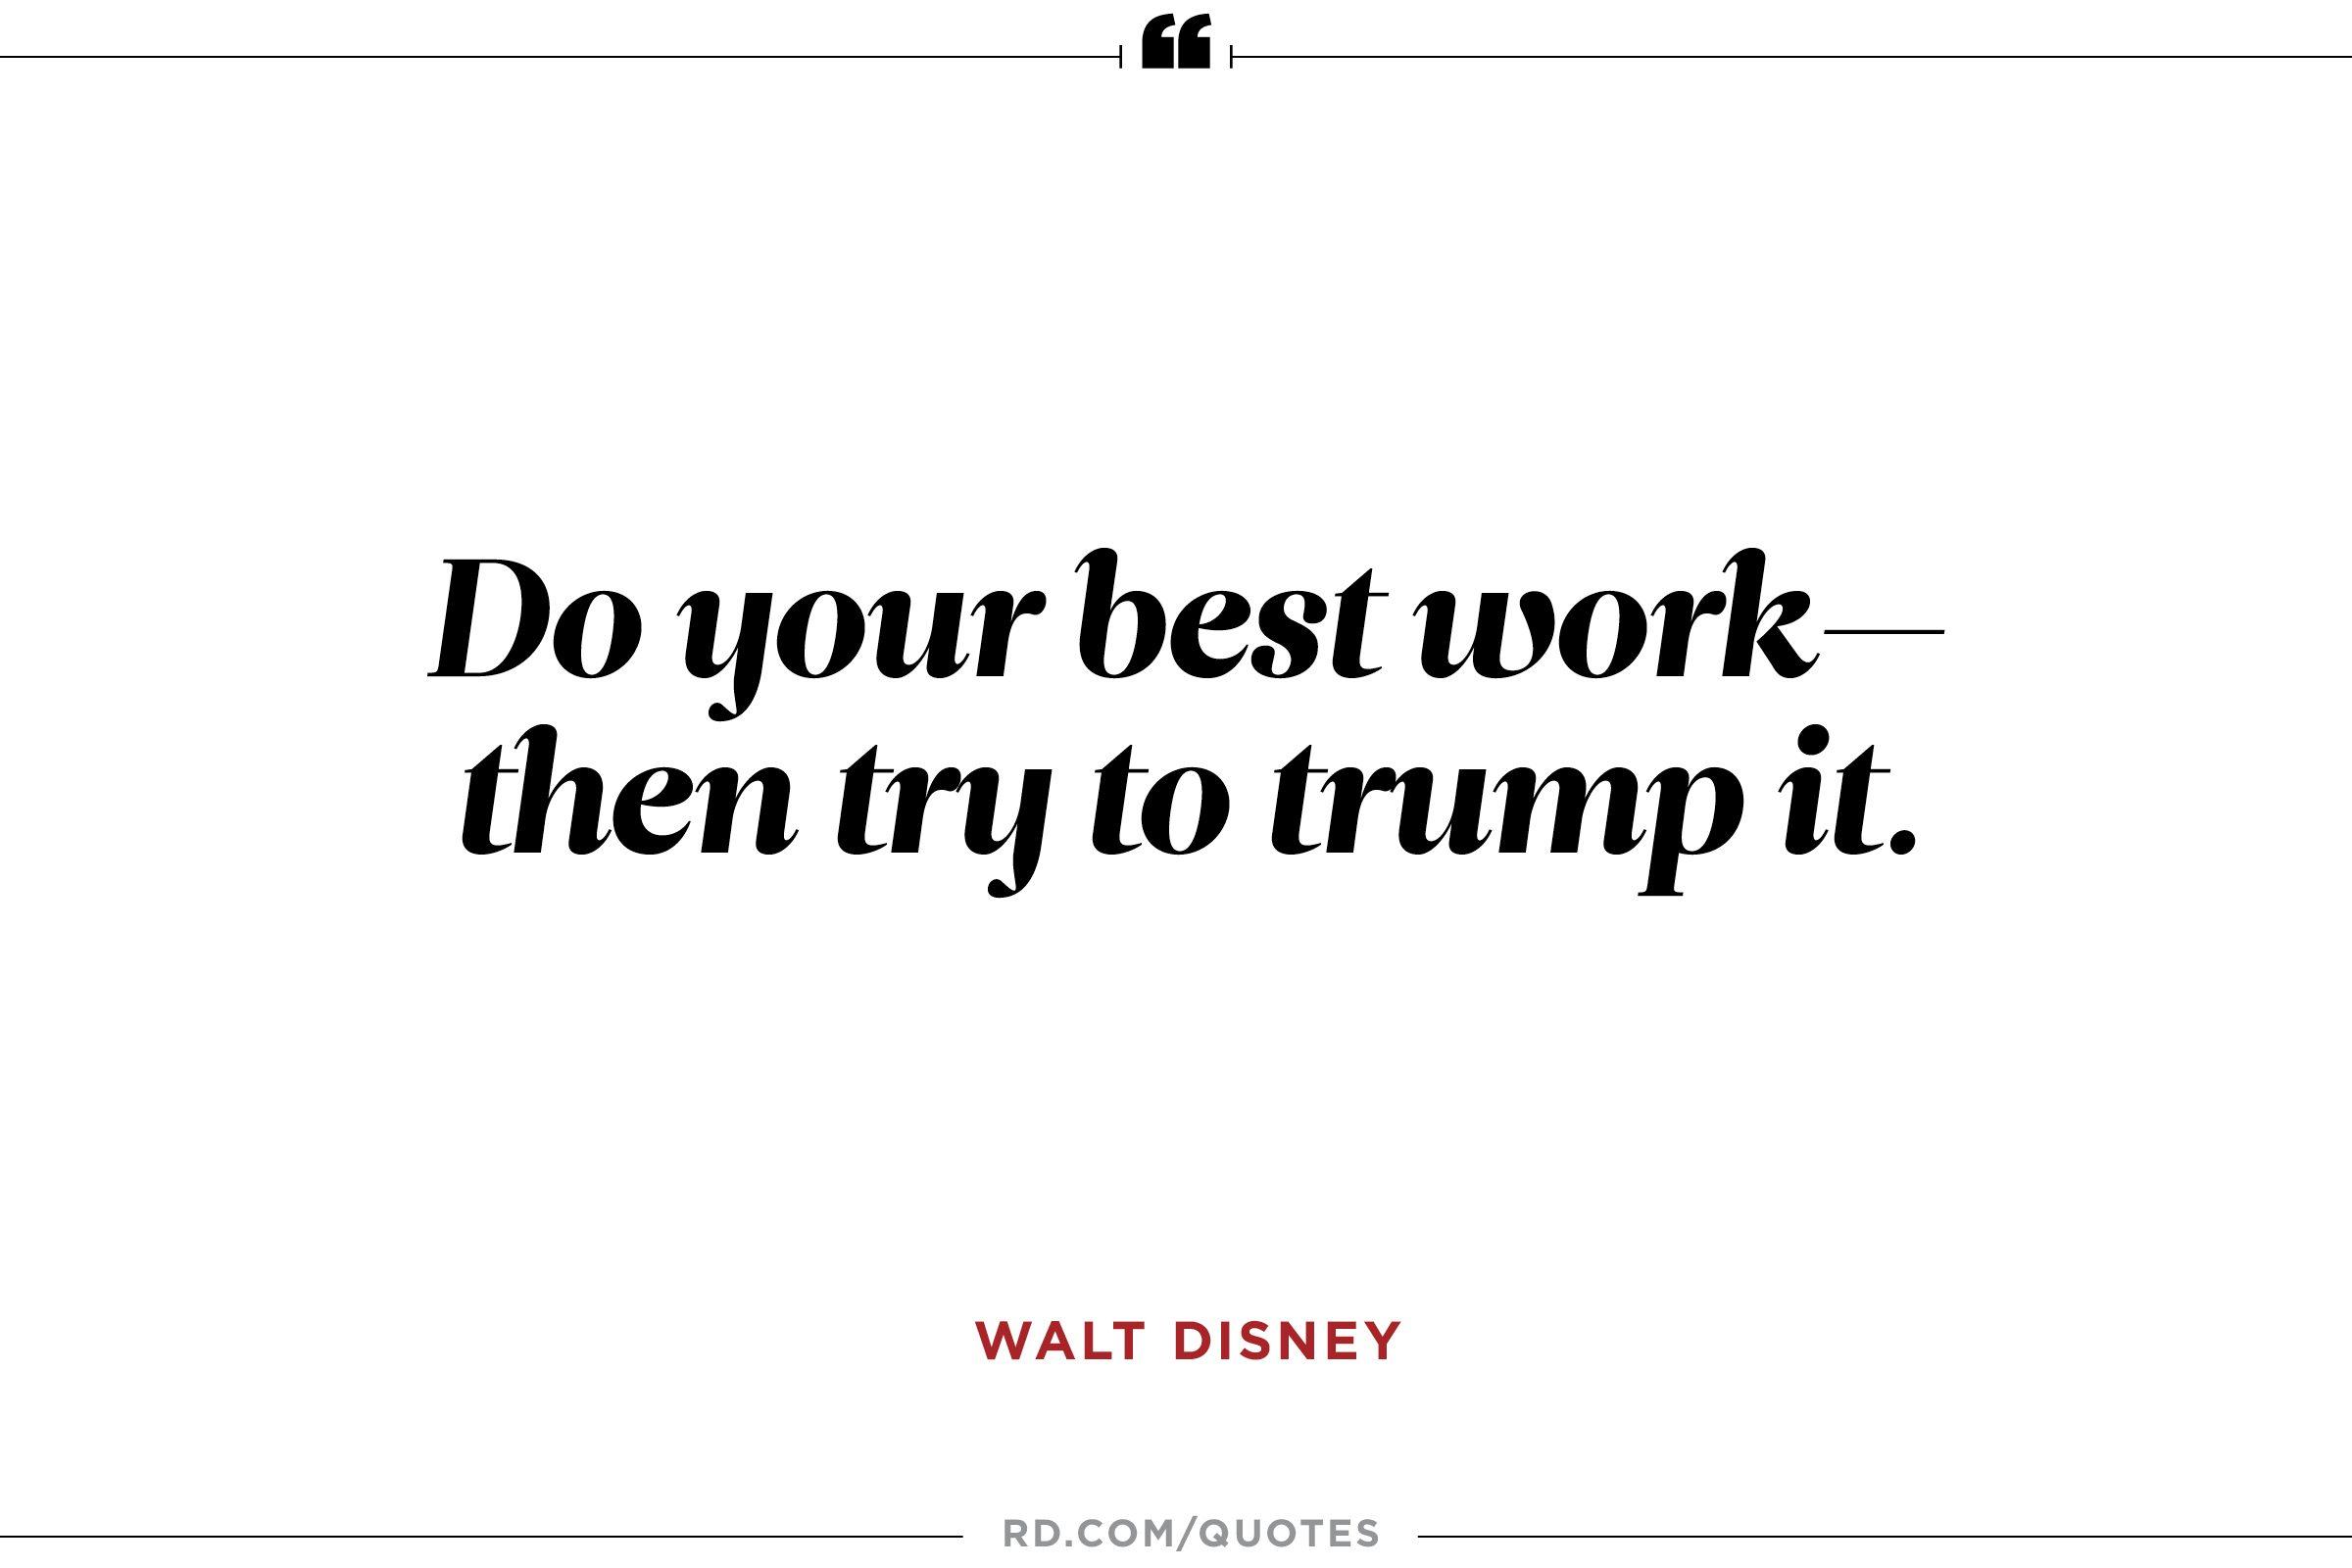 Walt Disney Quotes About Friendship Walt Disney Quote Brilliant Top 15 Walt Disney Quotes To Awaken